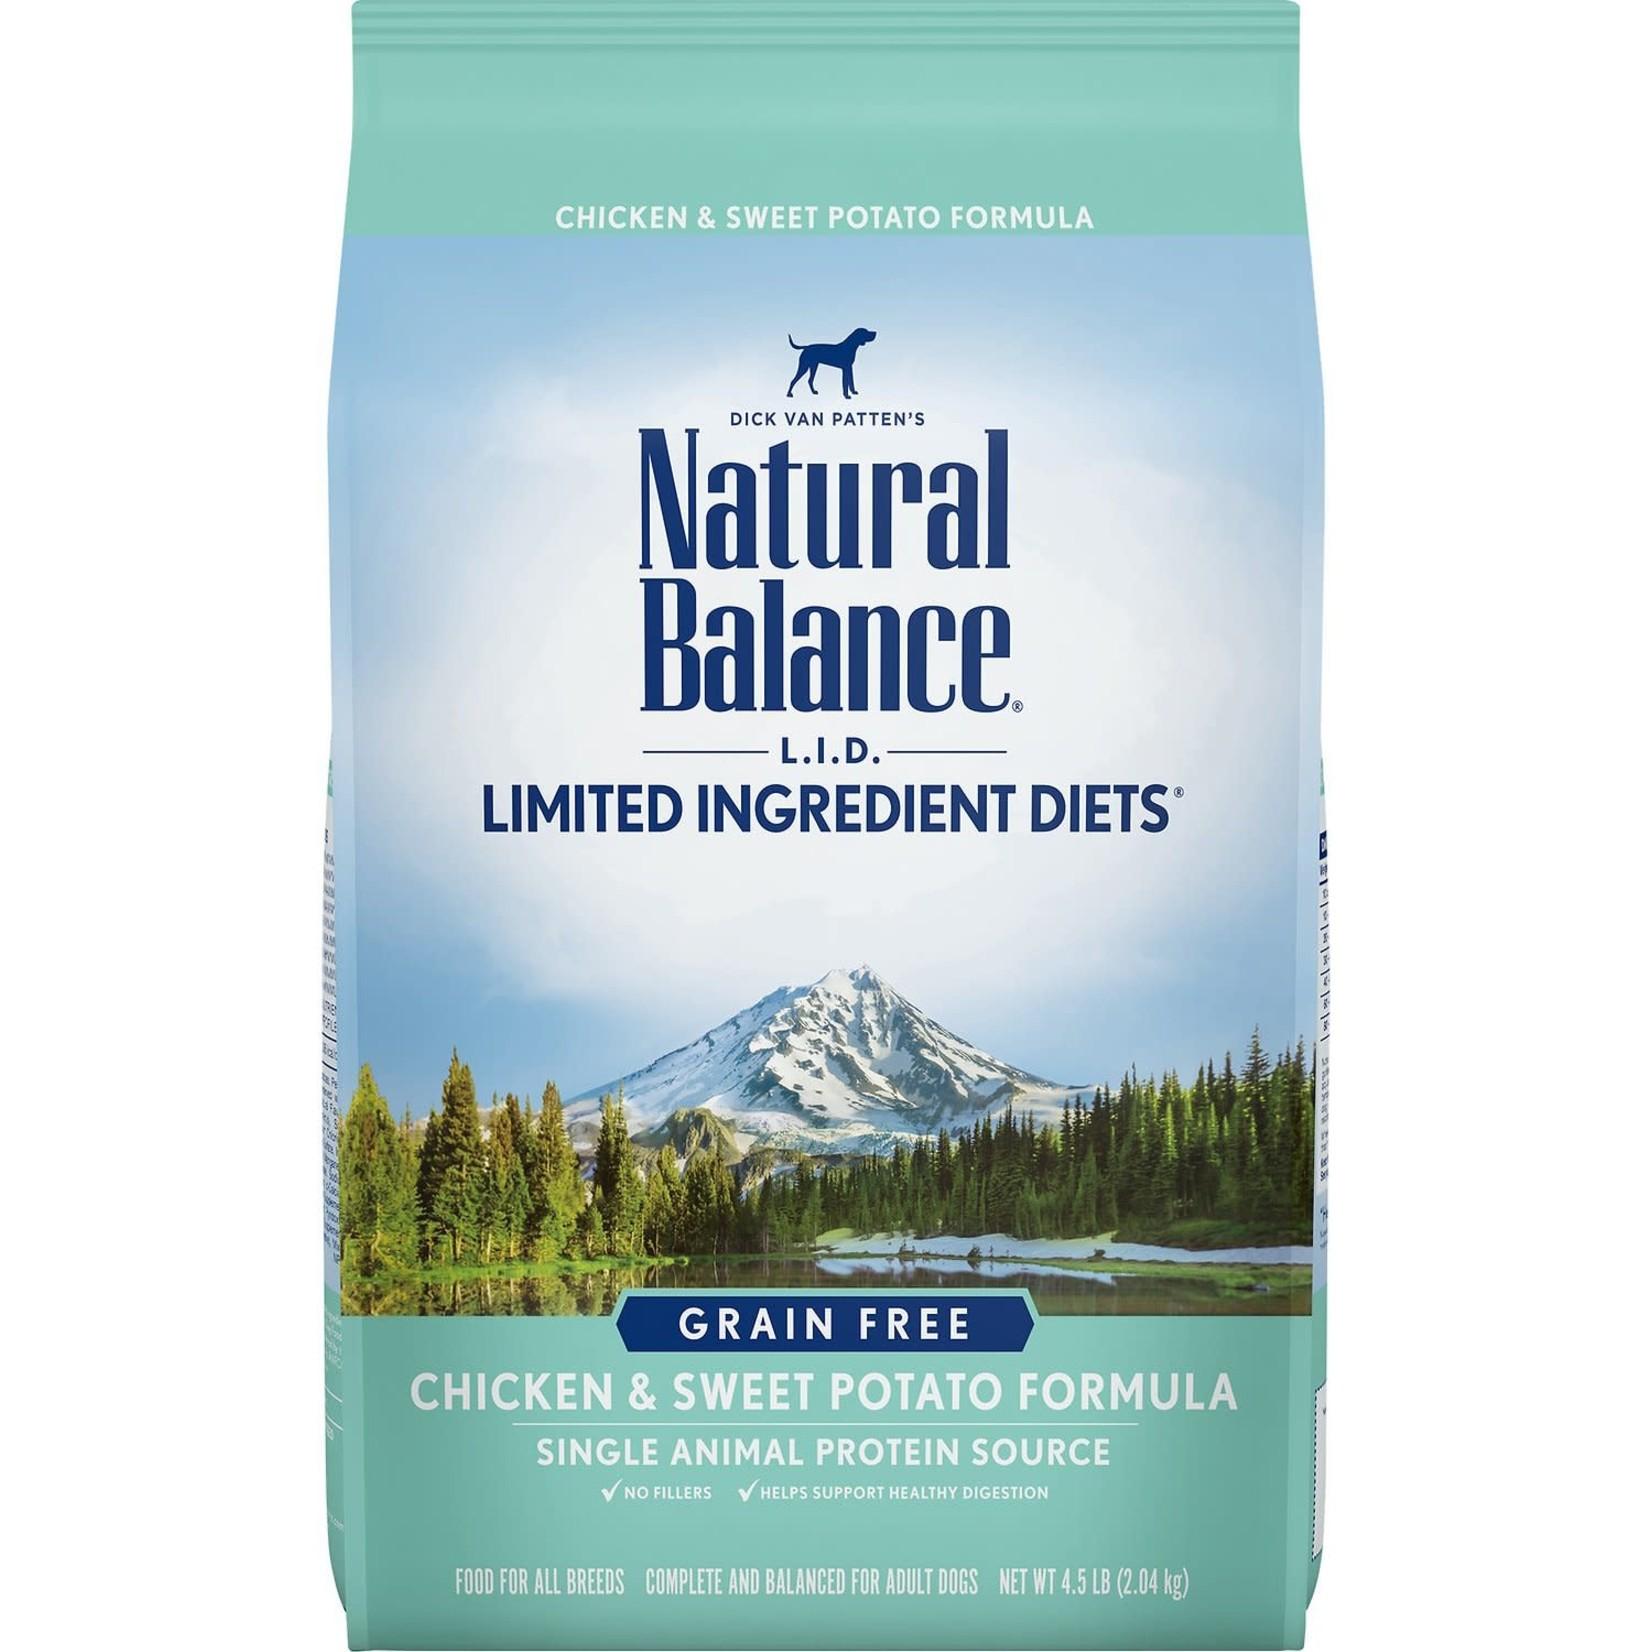 Natural Balance Natural Balance - Chicken & Sweet Potato